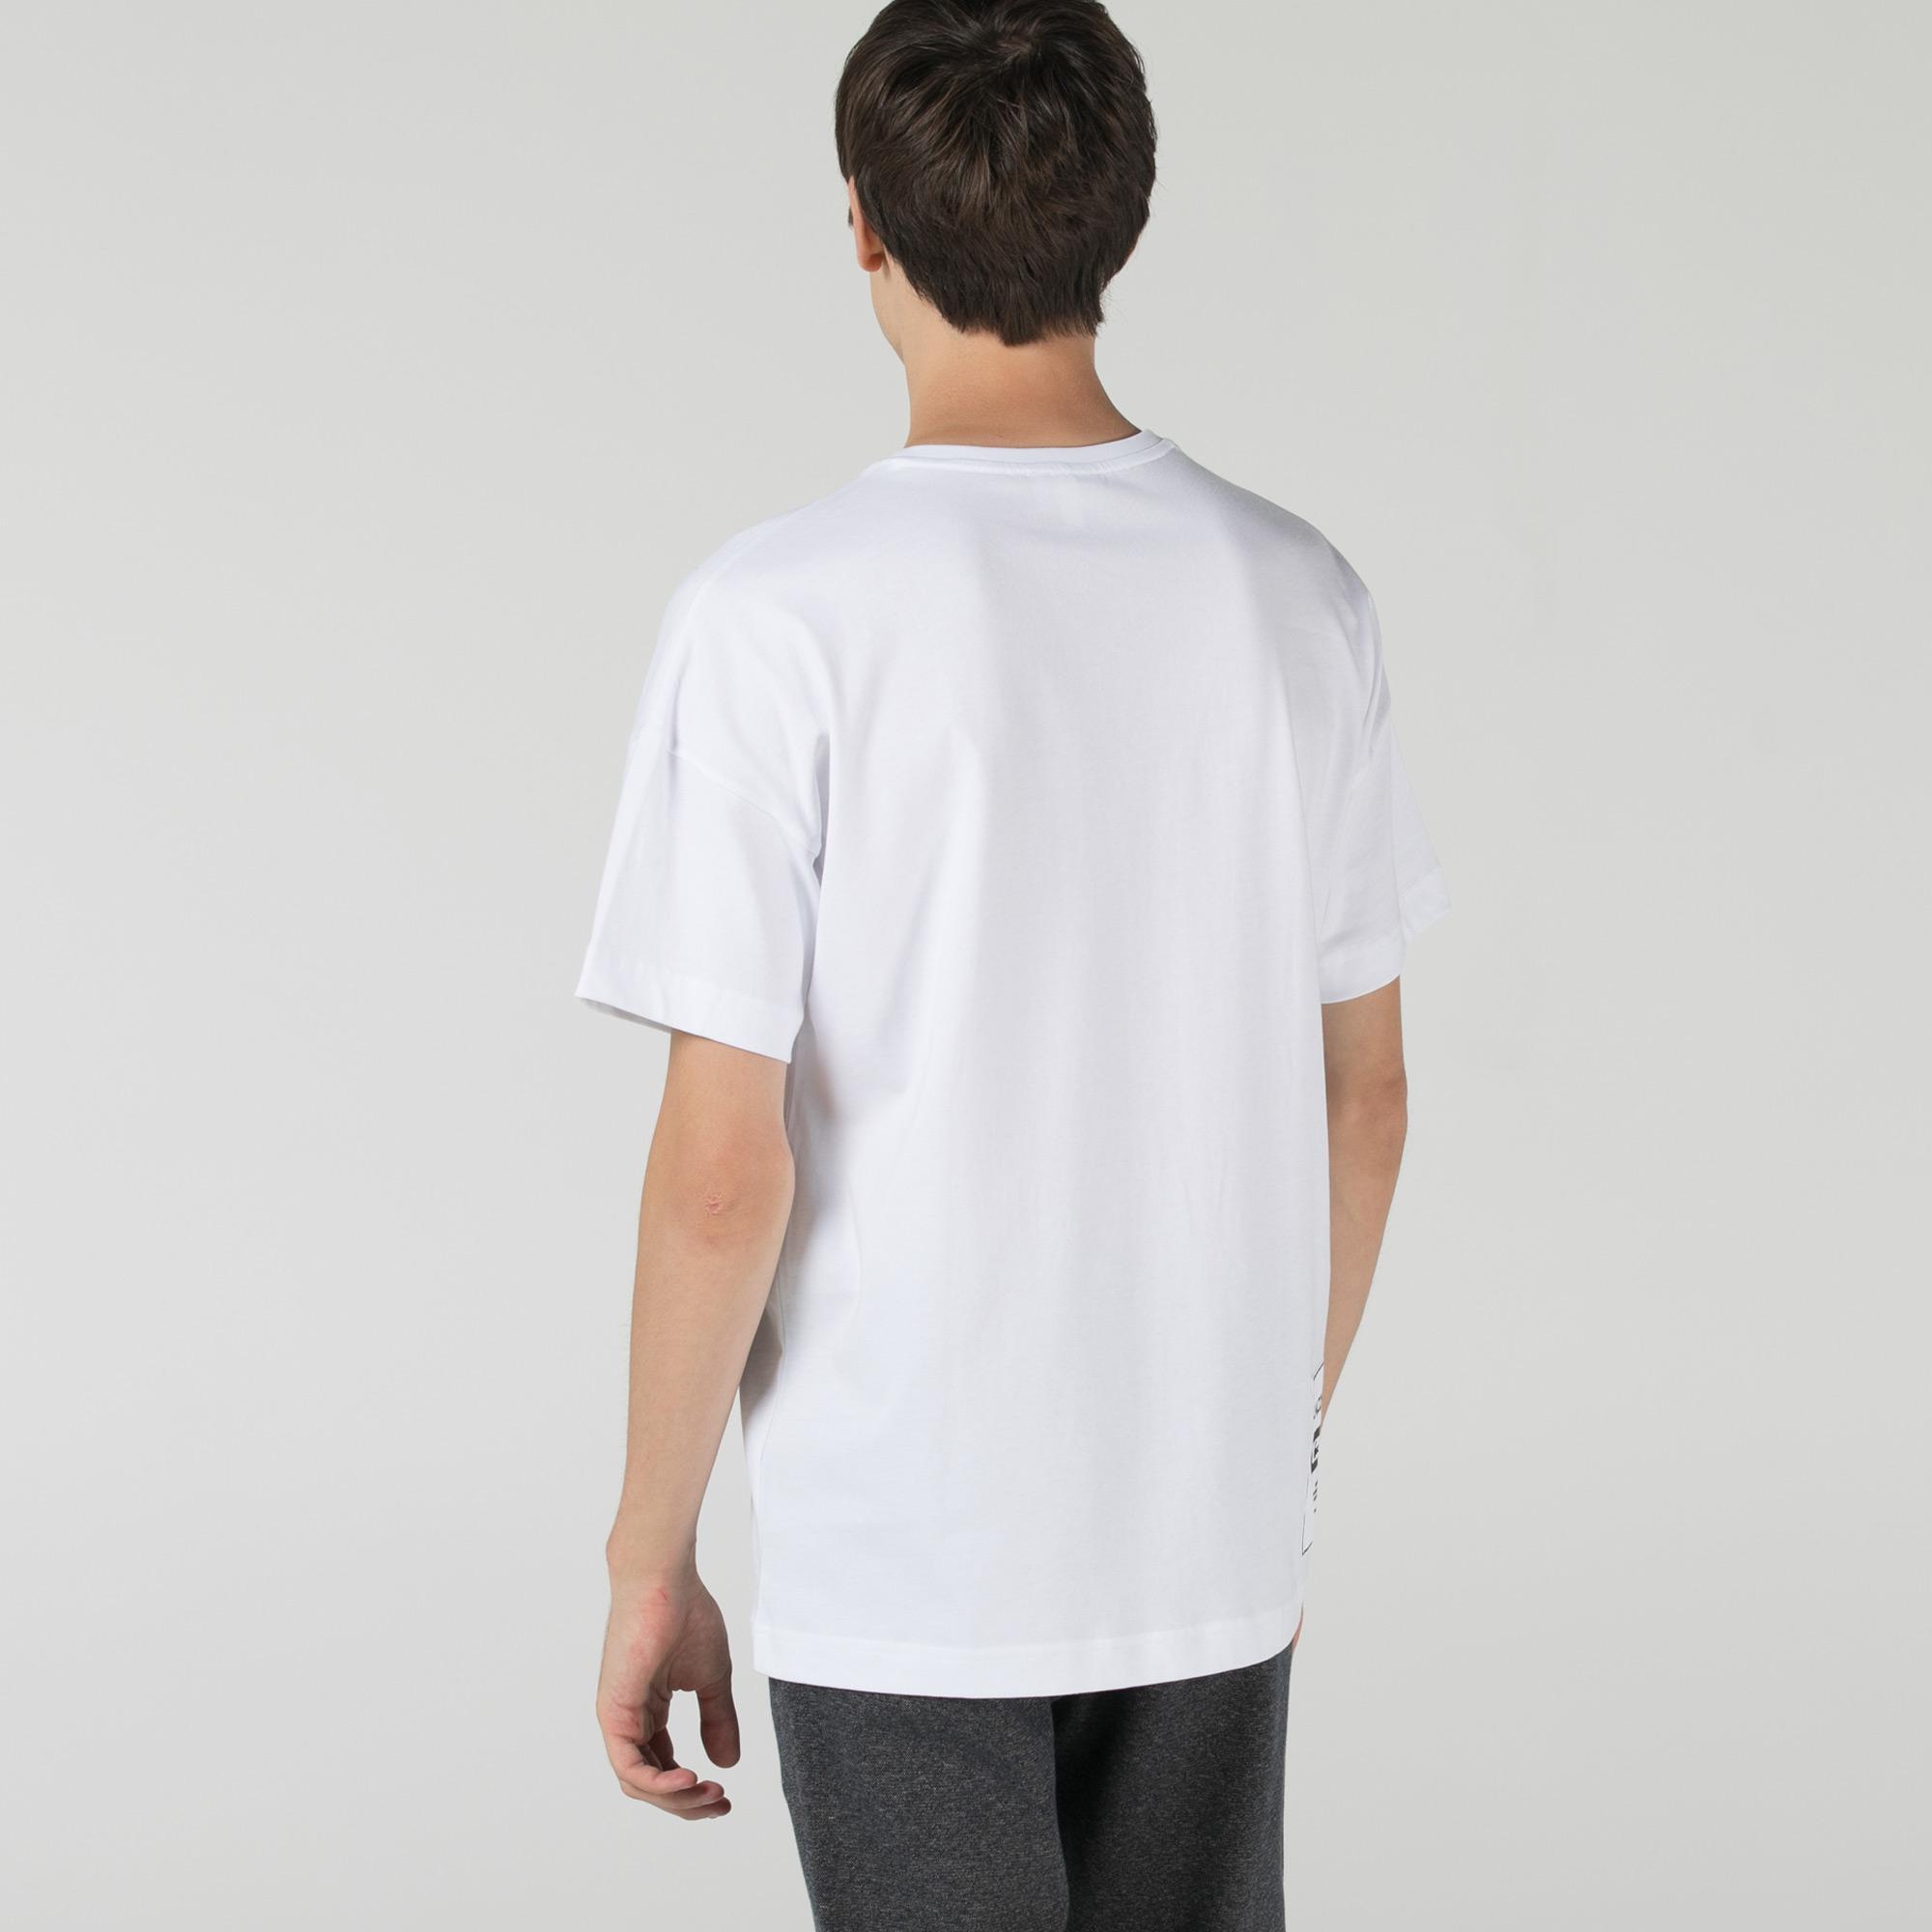 Lacoste Erkek Relaxed Fit Bisiklet Yaka Beyaz T-Shirt